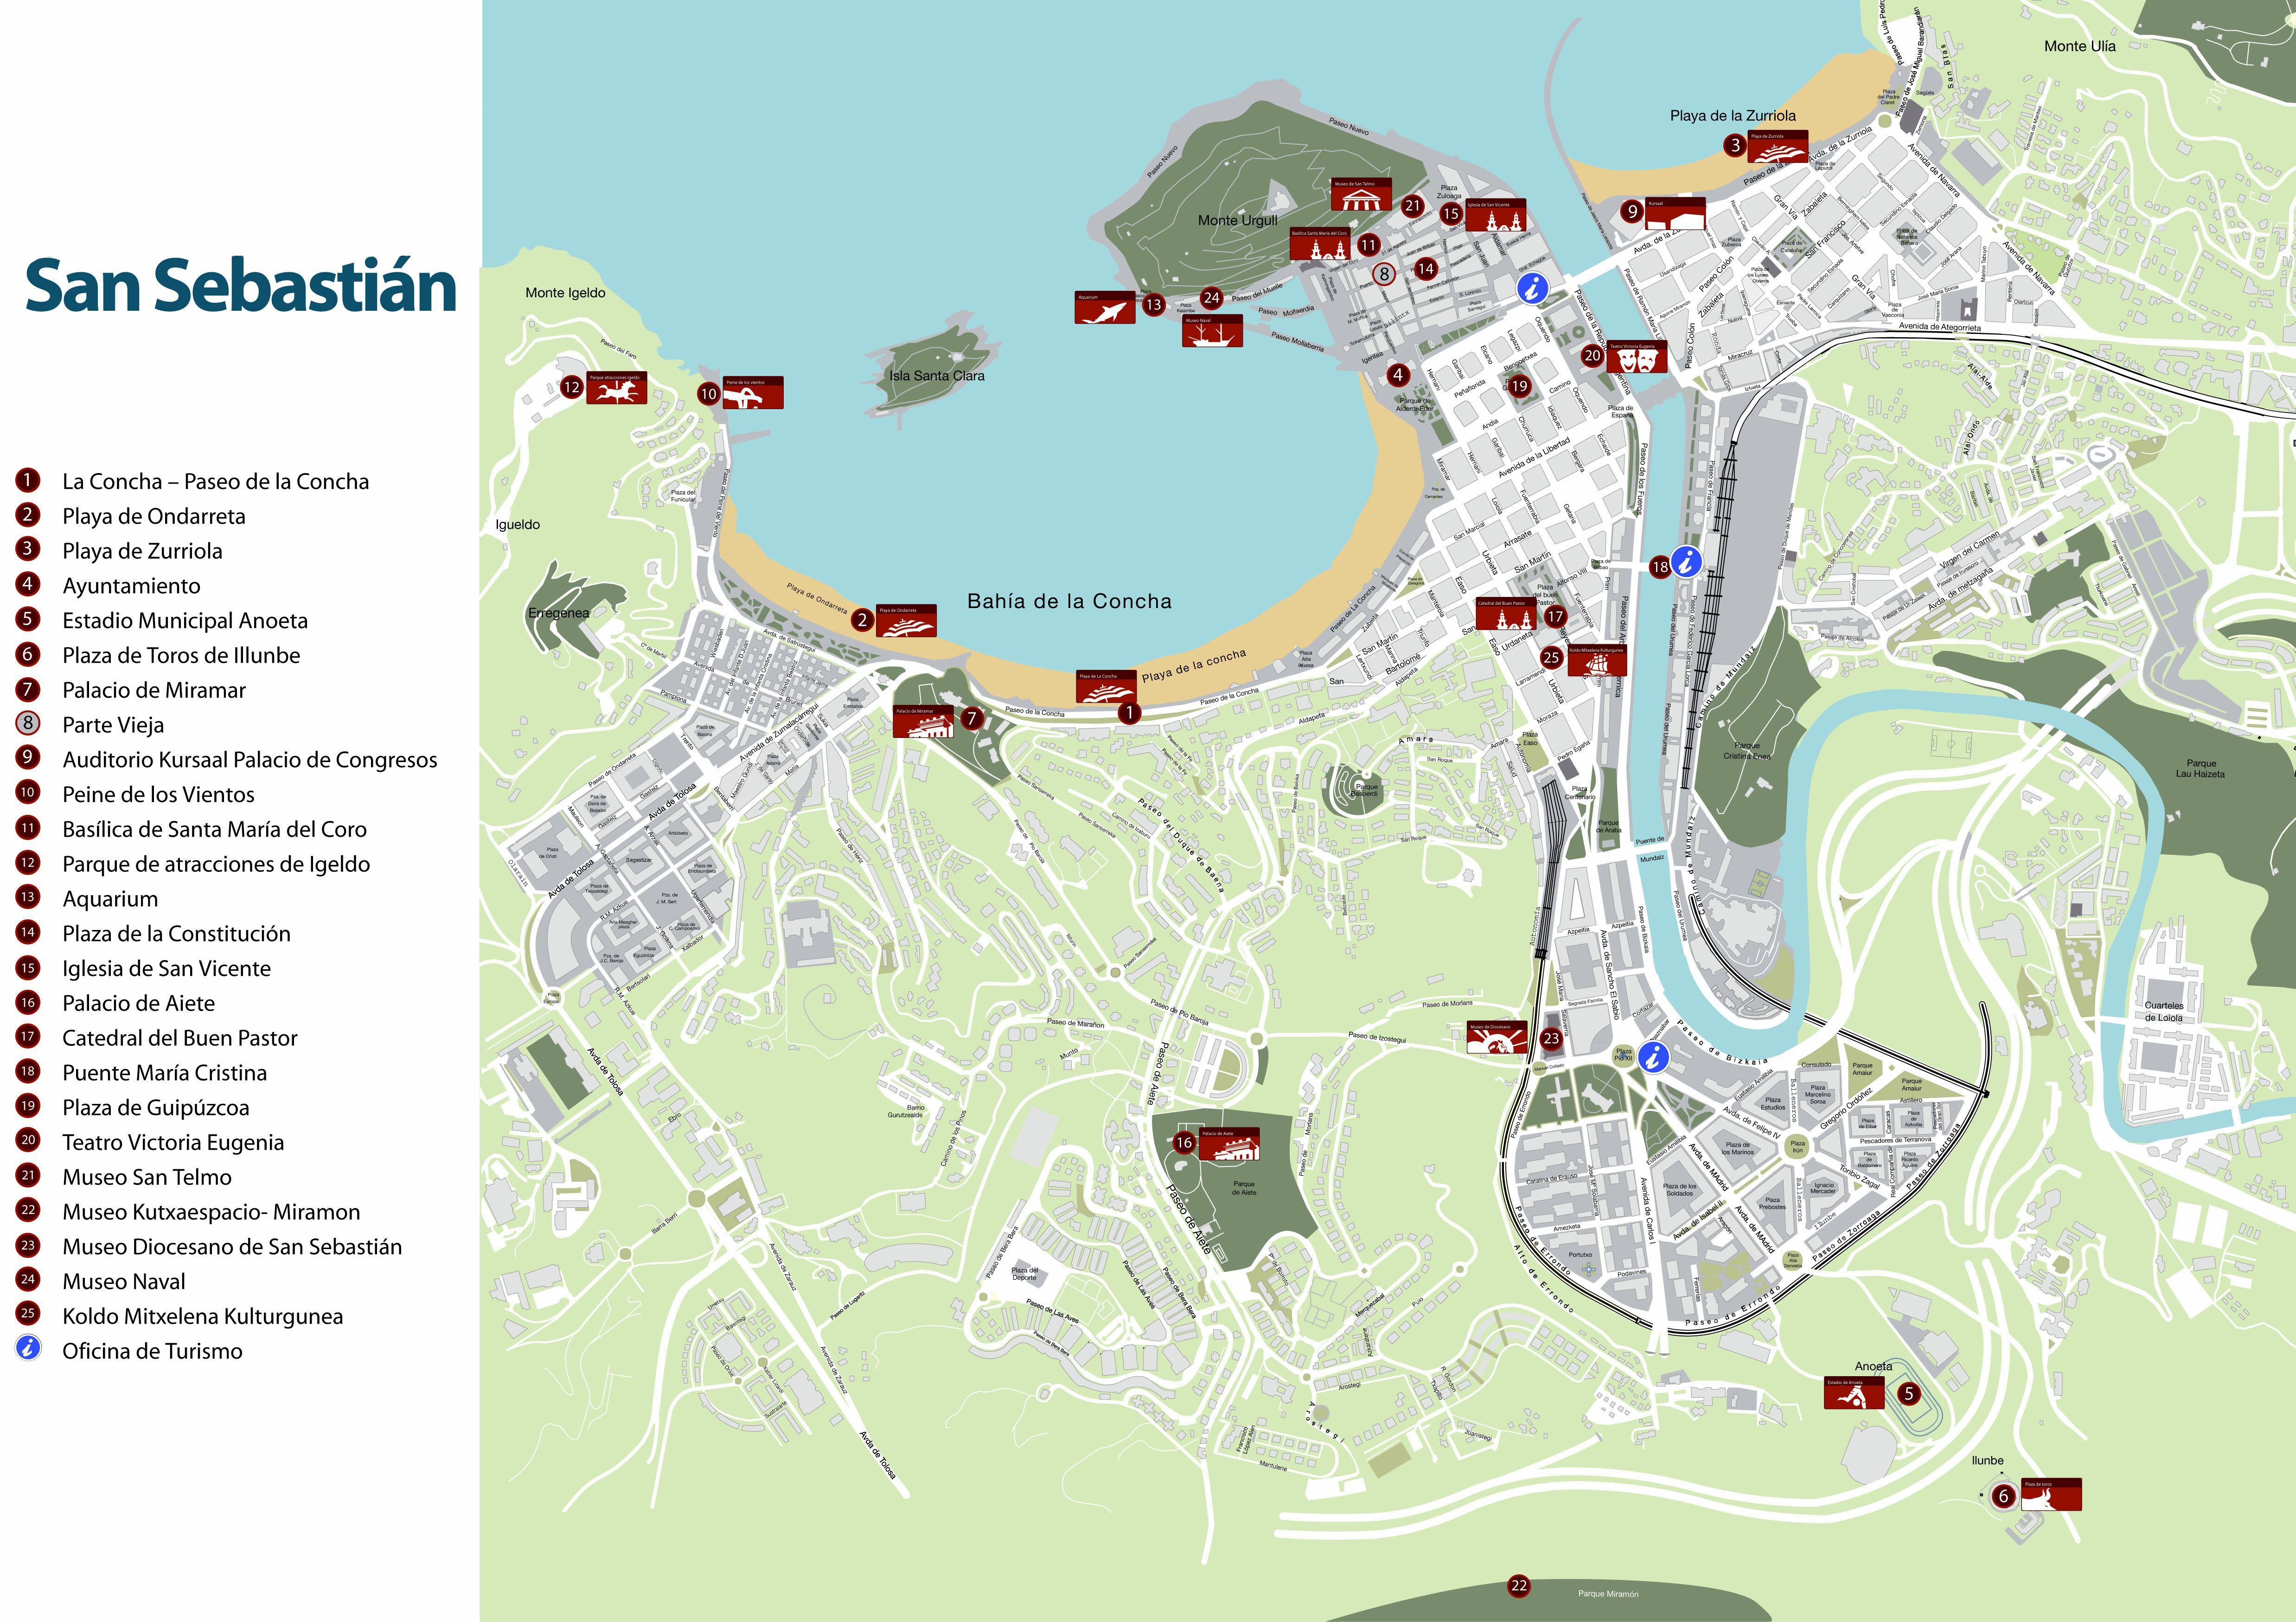 San Sebastian Maps for Free Download and Print